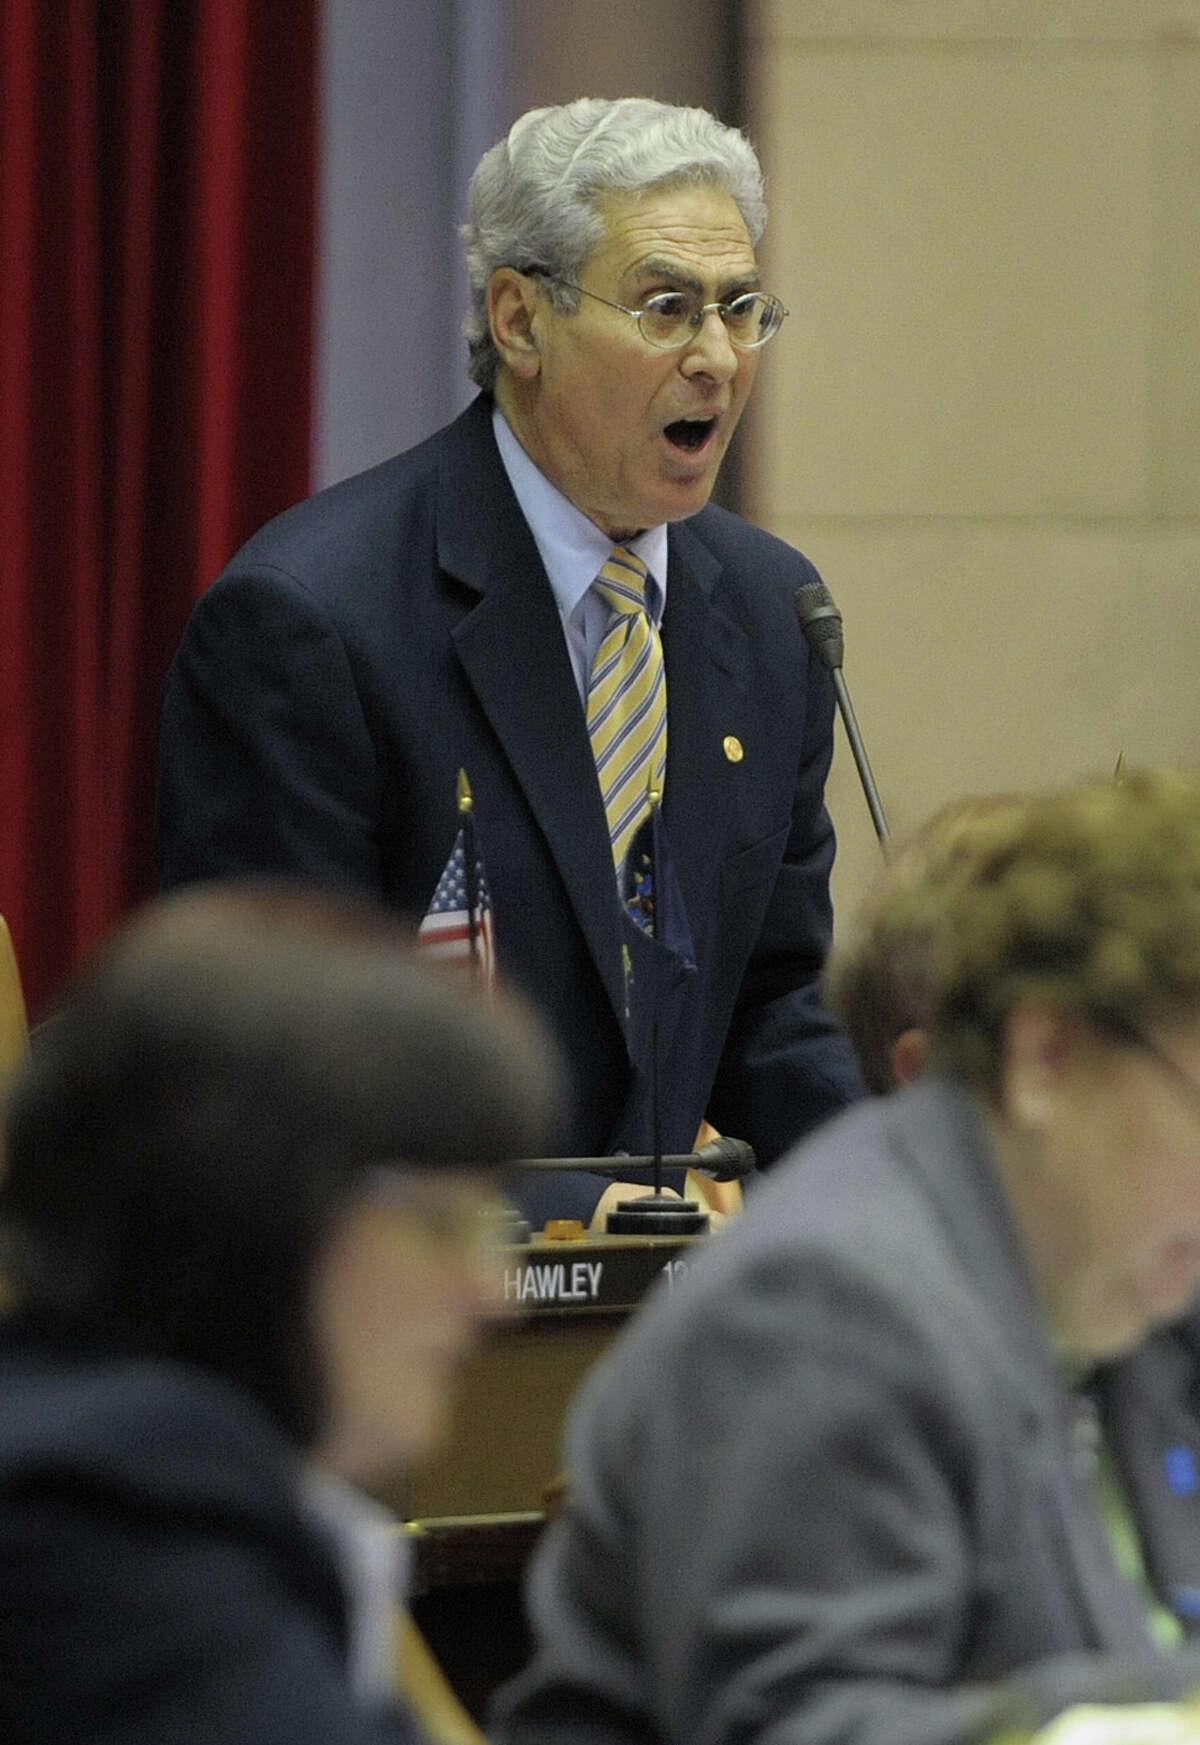 Assemblyman Steve Katz rises to speak during a recent debate in the Assembly. (Paul Buckowski / Times Union)